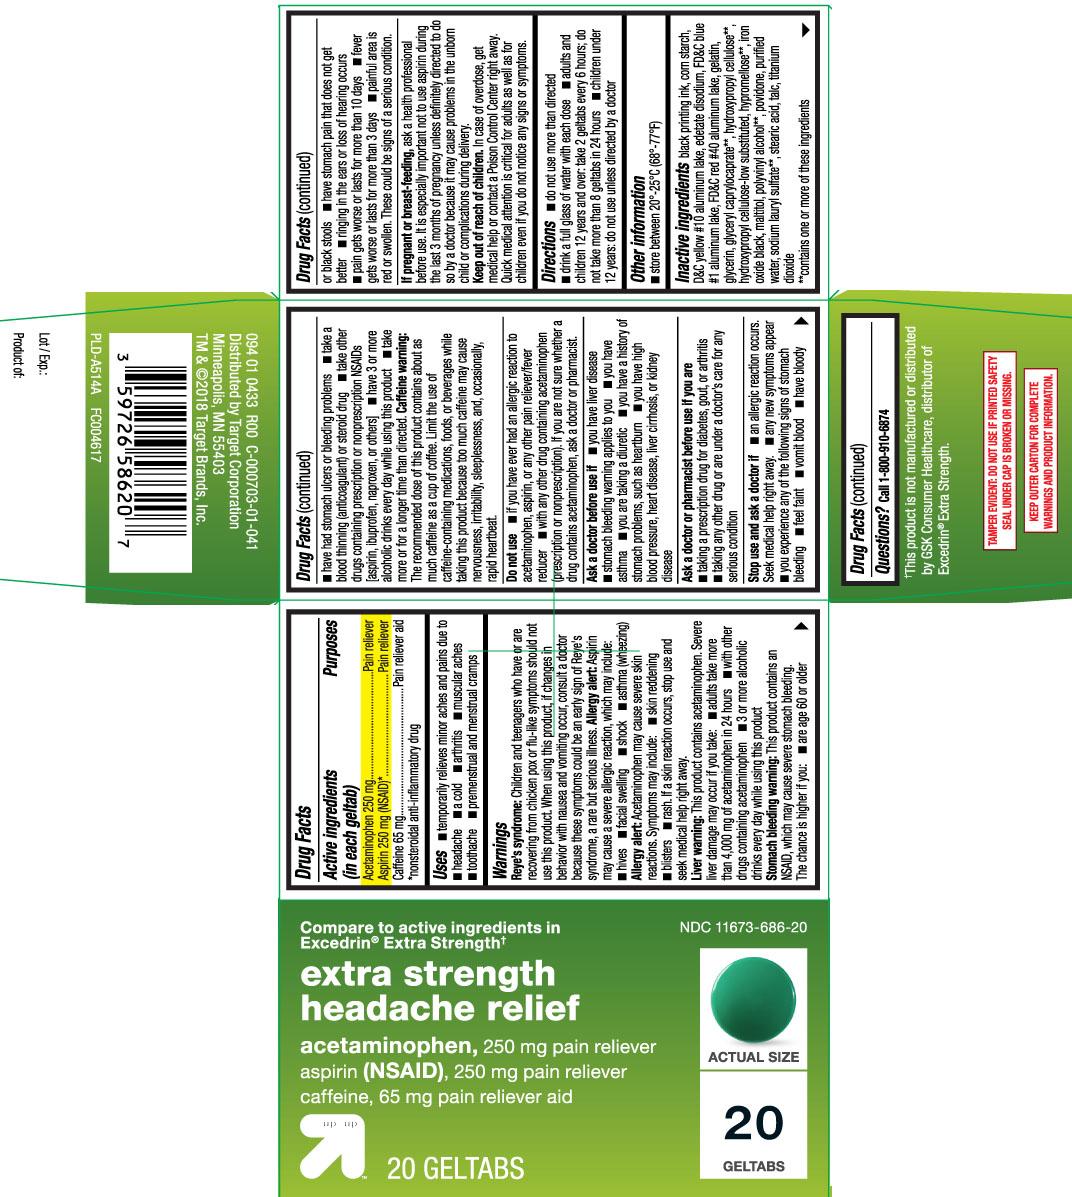 Acetaminophen 250 mg, Aspirin 250 mg (NSAID)*, Caffeine 65 mg, *nonsteroidal anti-inflammatory drug